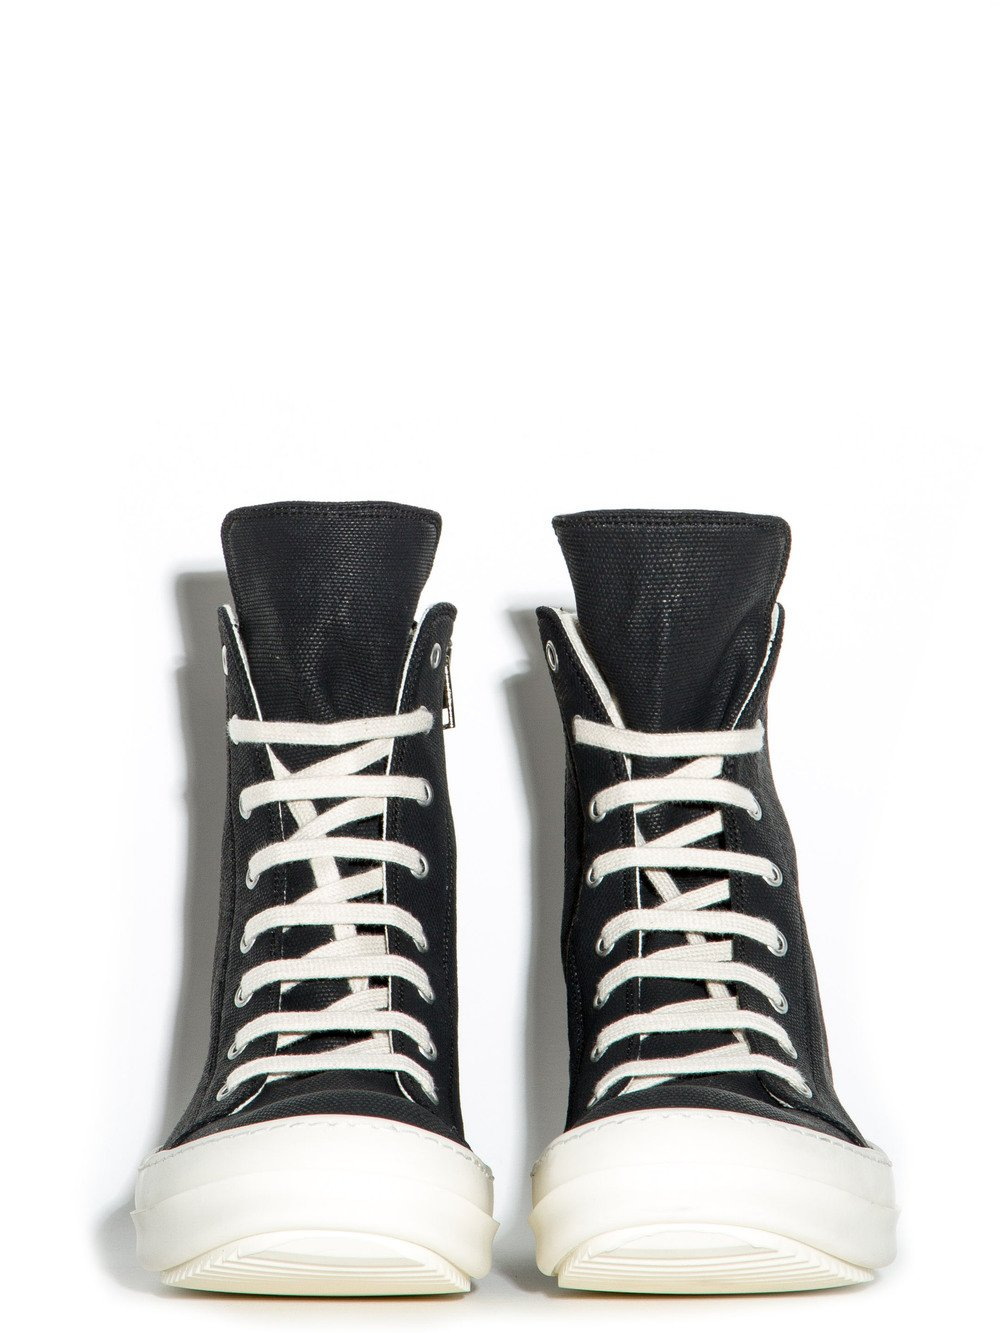 Drkshdw Shoes Rick Owens